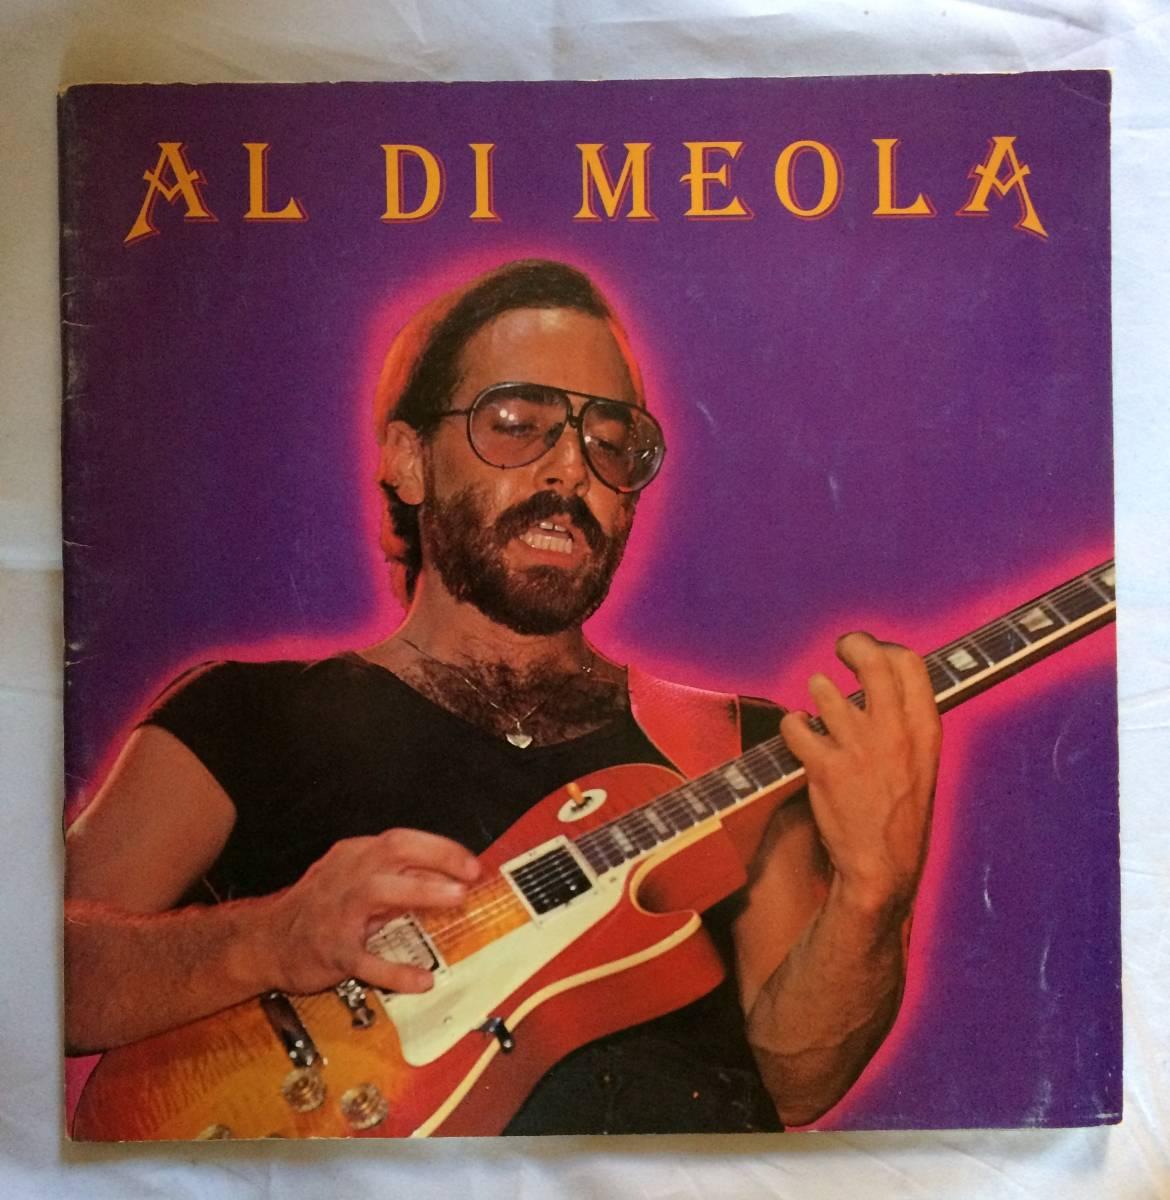 AL DI MEOLA 1981 パンフレット